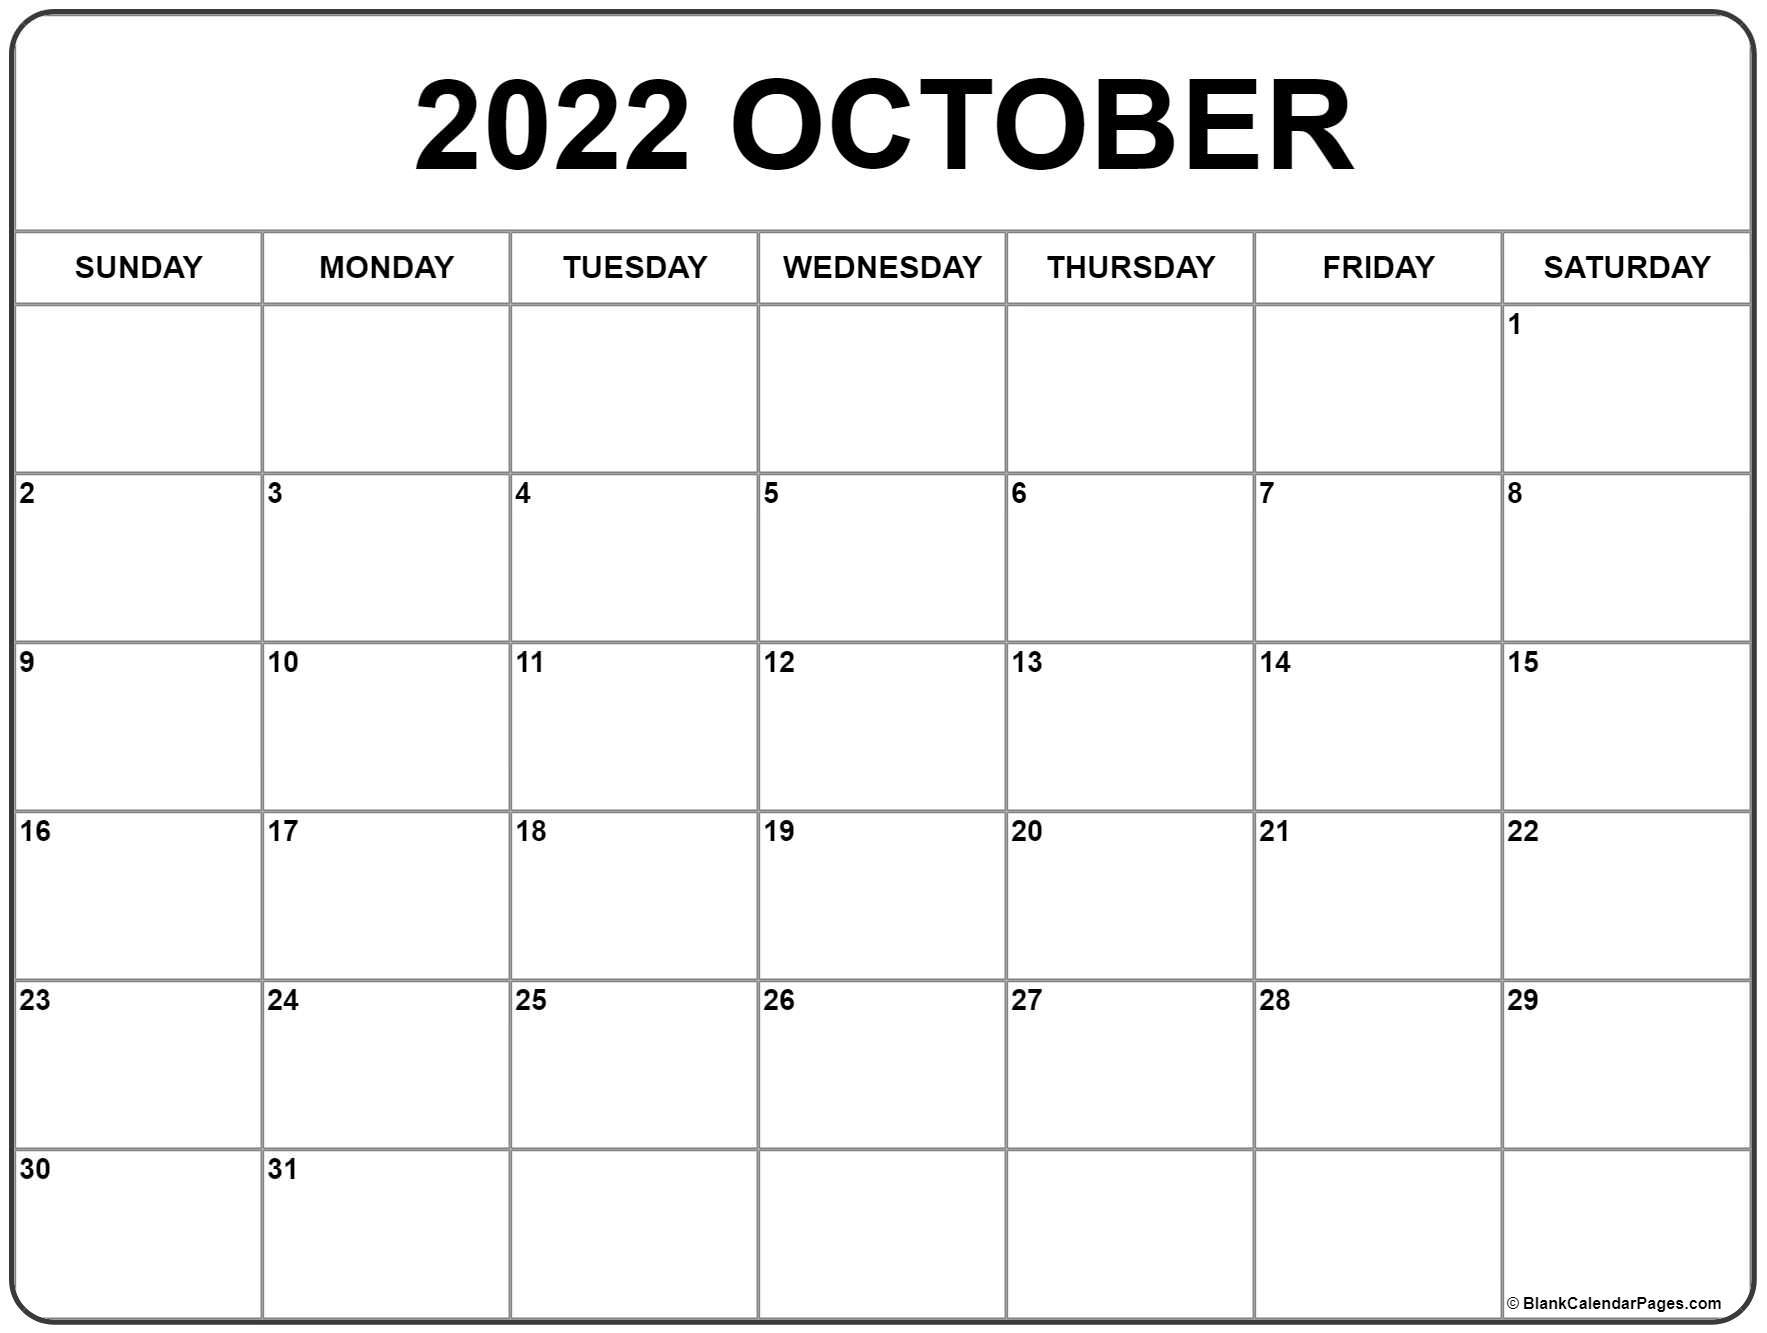 October 2018 calendar . October 2018 calendar printableOctober 2018 printable calendar. October calendar 2018